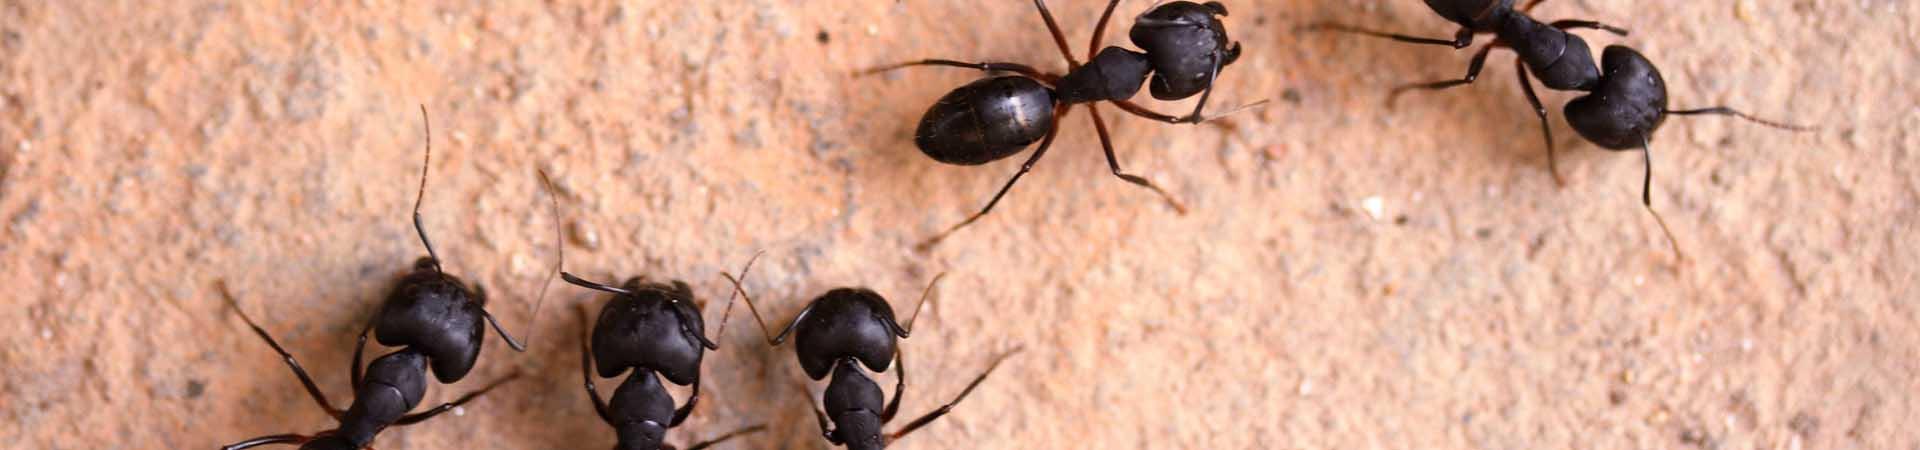 mainslide_ants_3